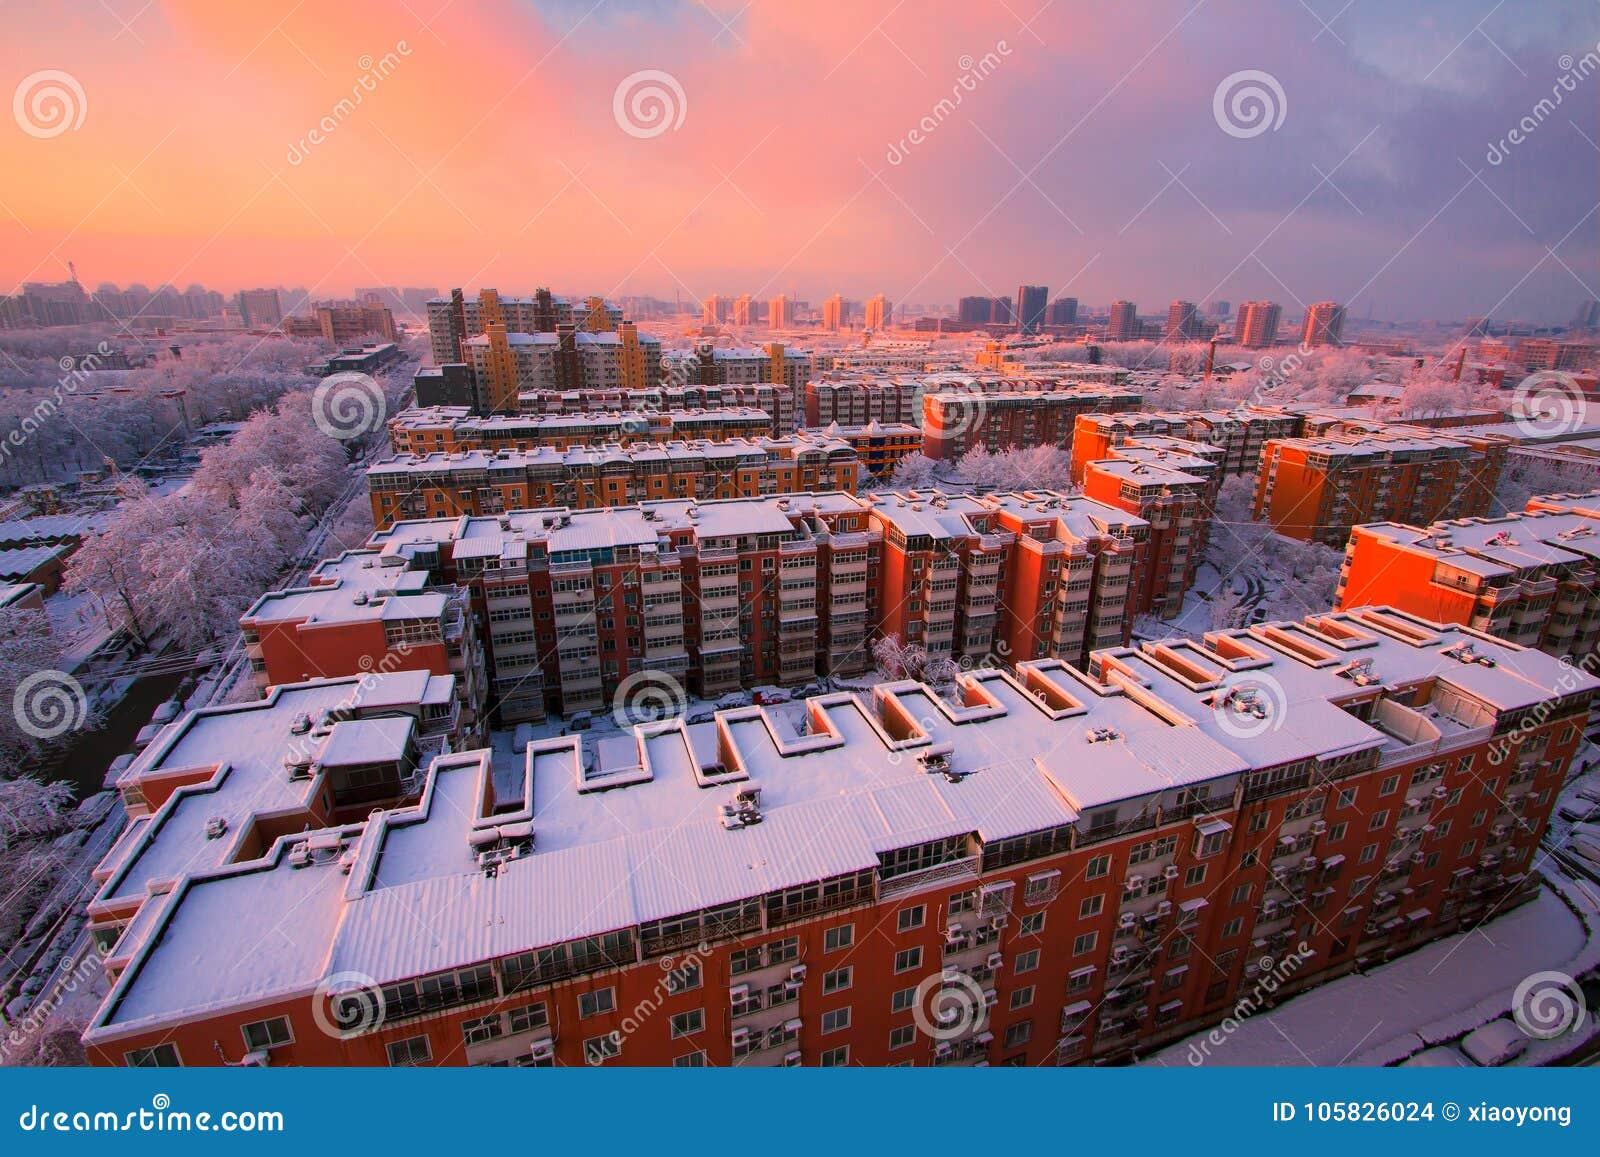 Neighborhood community snow and sunrise